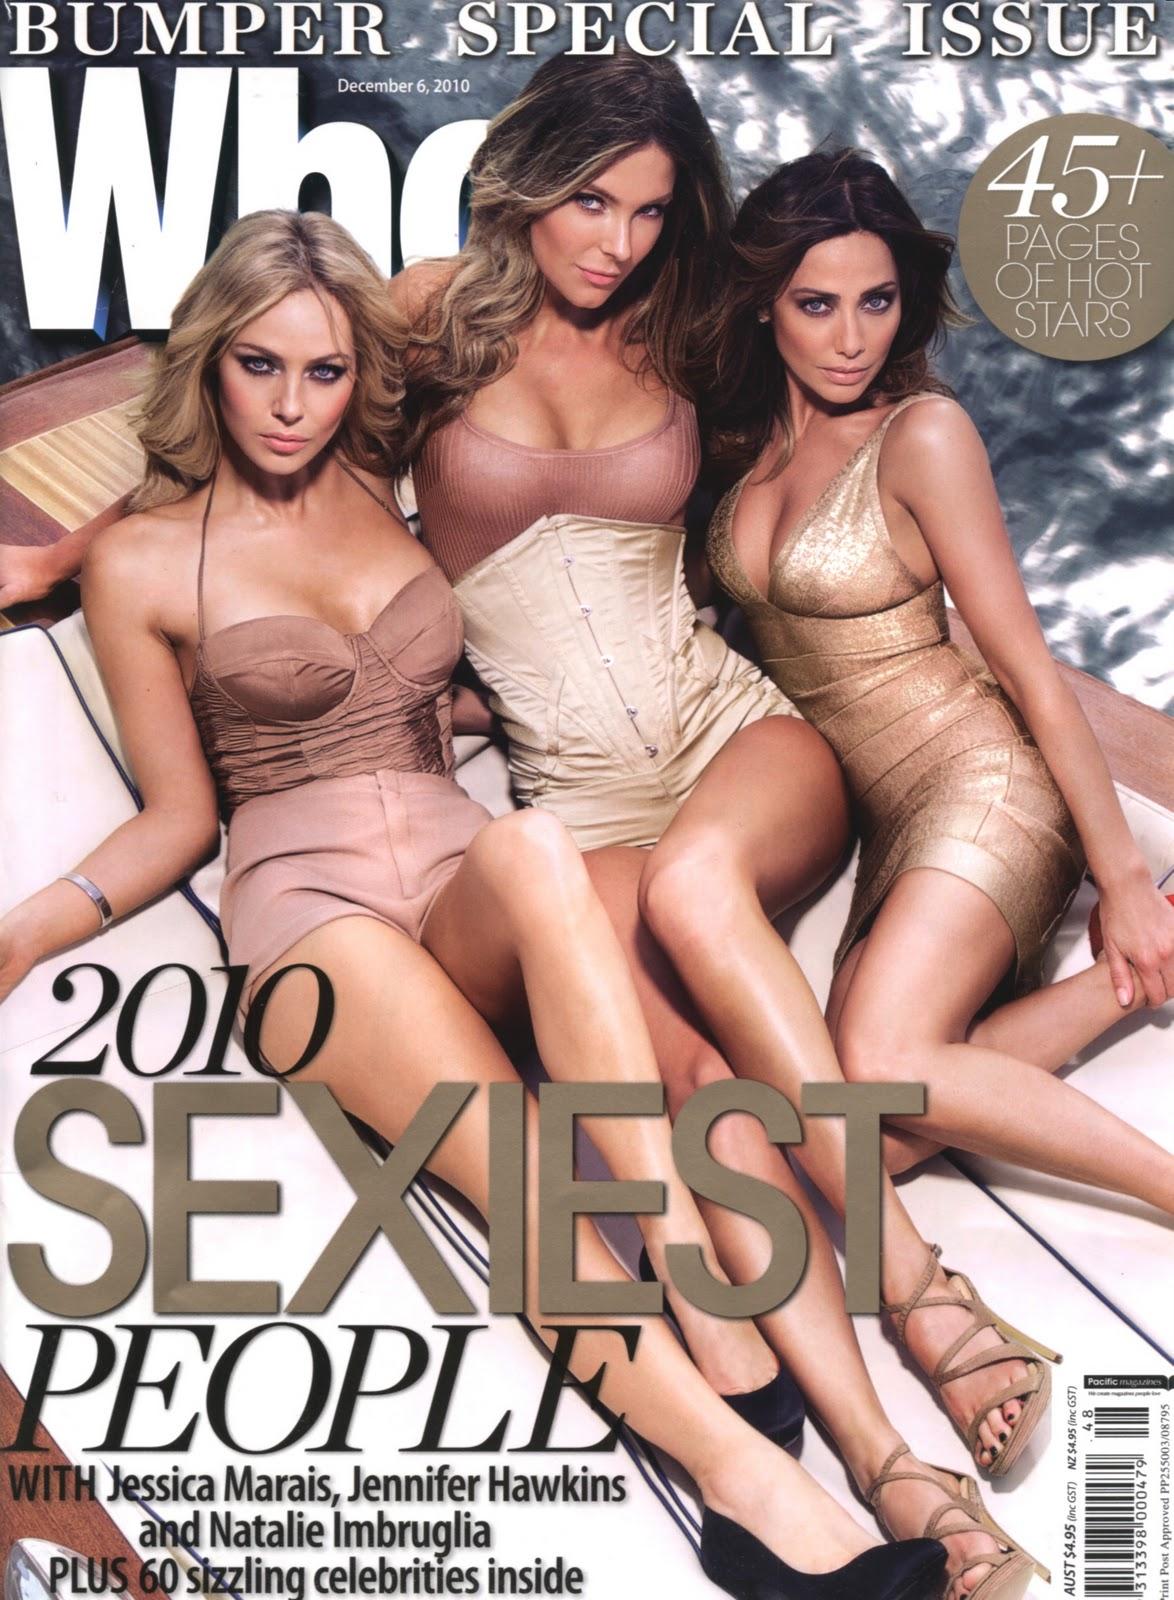 http://2.bp.blogspot.com/_CYVU6AZl2i8/TPpnUG0Z0-I/AAAAAAAAHl4/p52nSqGTWUg/s1600/22510_who1_122_19loJennifer+Hawkins%252CNat+Imbruglia%252CJessica+Marais+and+Jennifer+Aniston+%2540+Australian+Who+Magazine+Sexiest+People.jpg